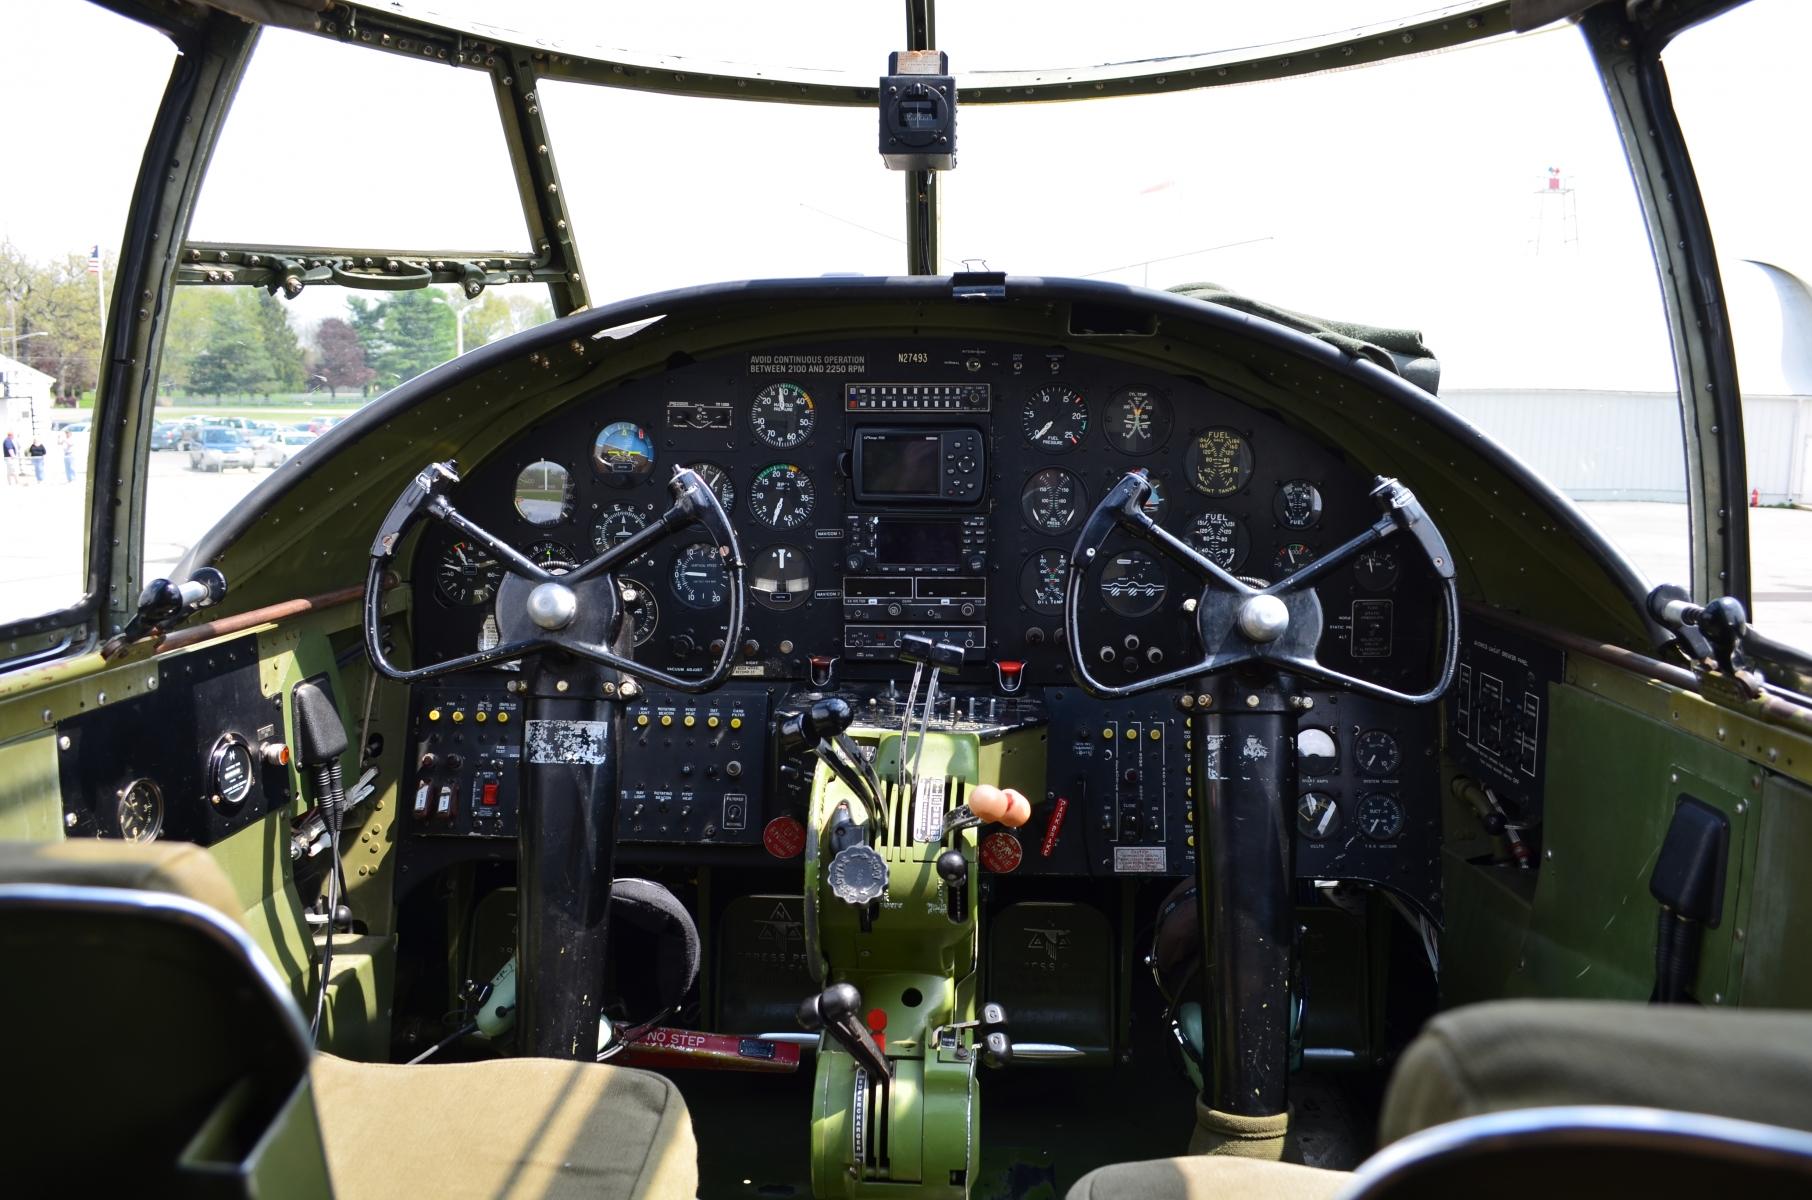 Snacko's B-25 Ride